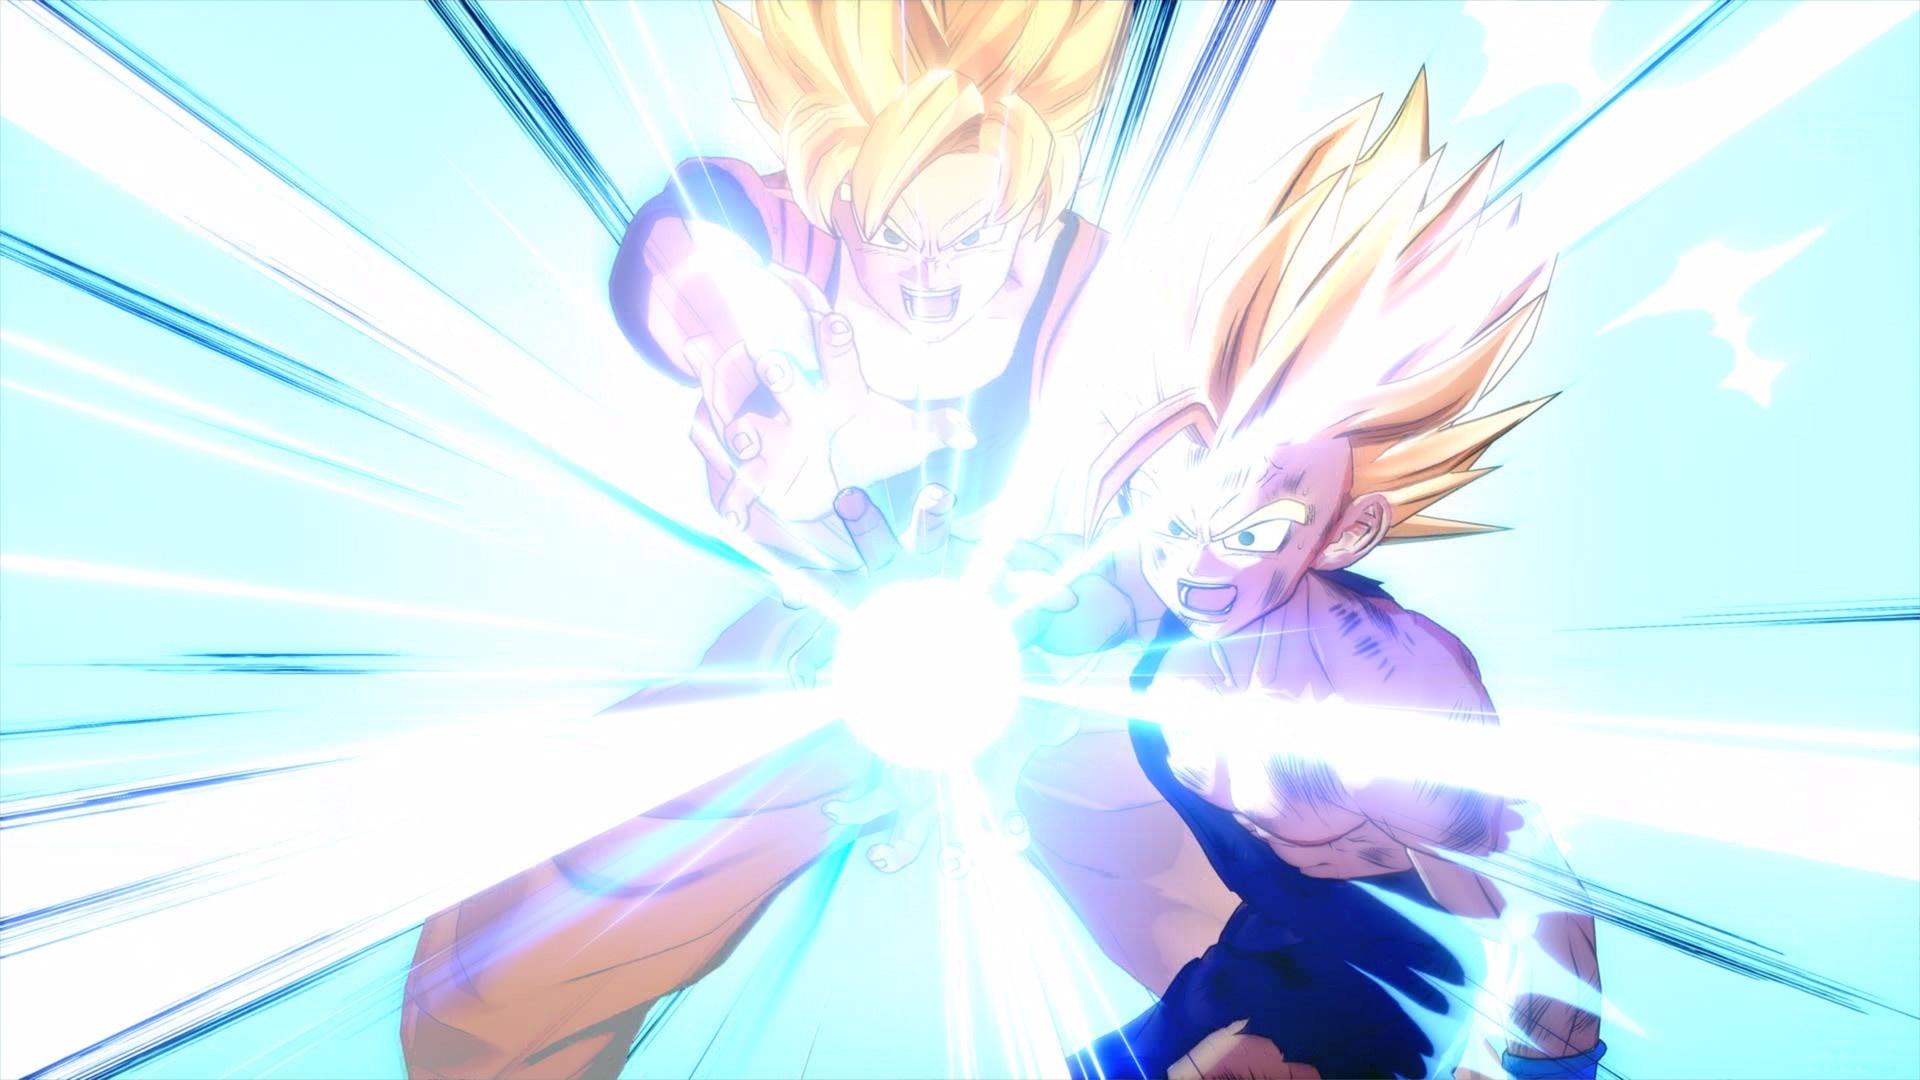 Bandai Namco опубликовала вступительный ролик Dragon Ball Z: Kakarot